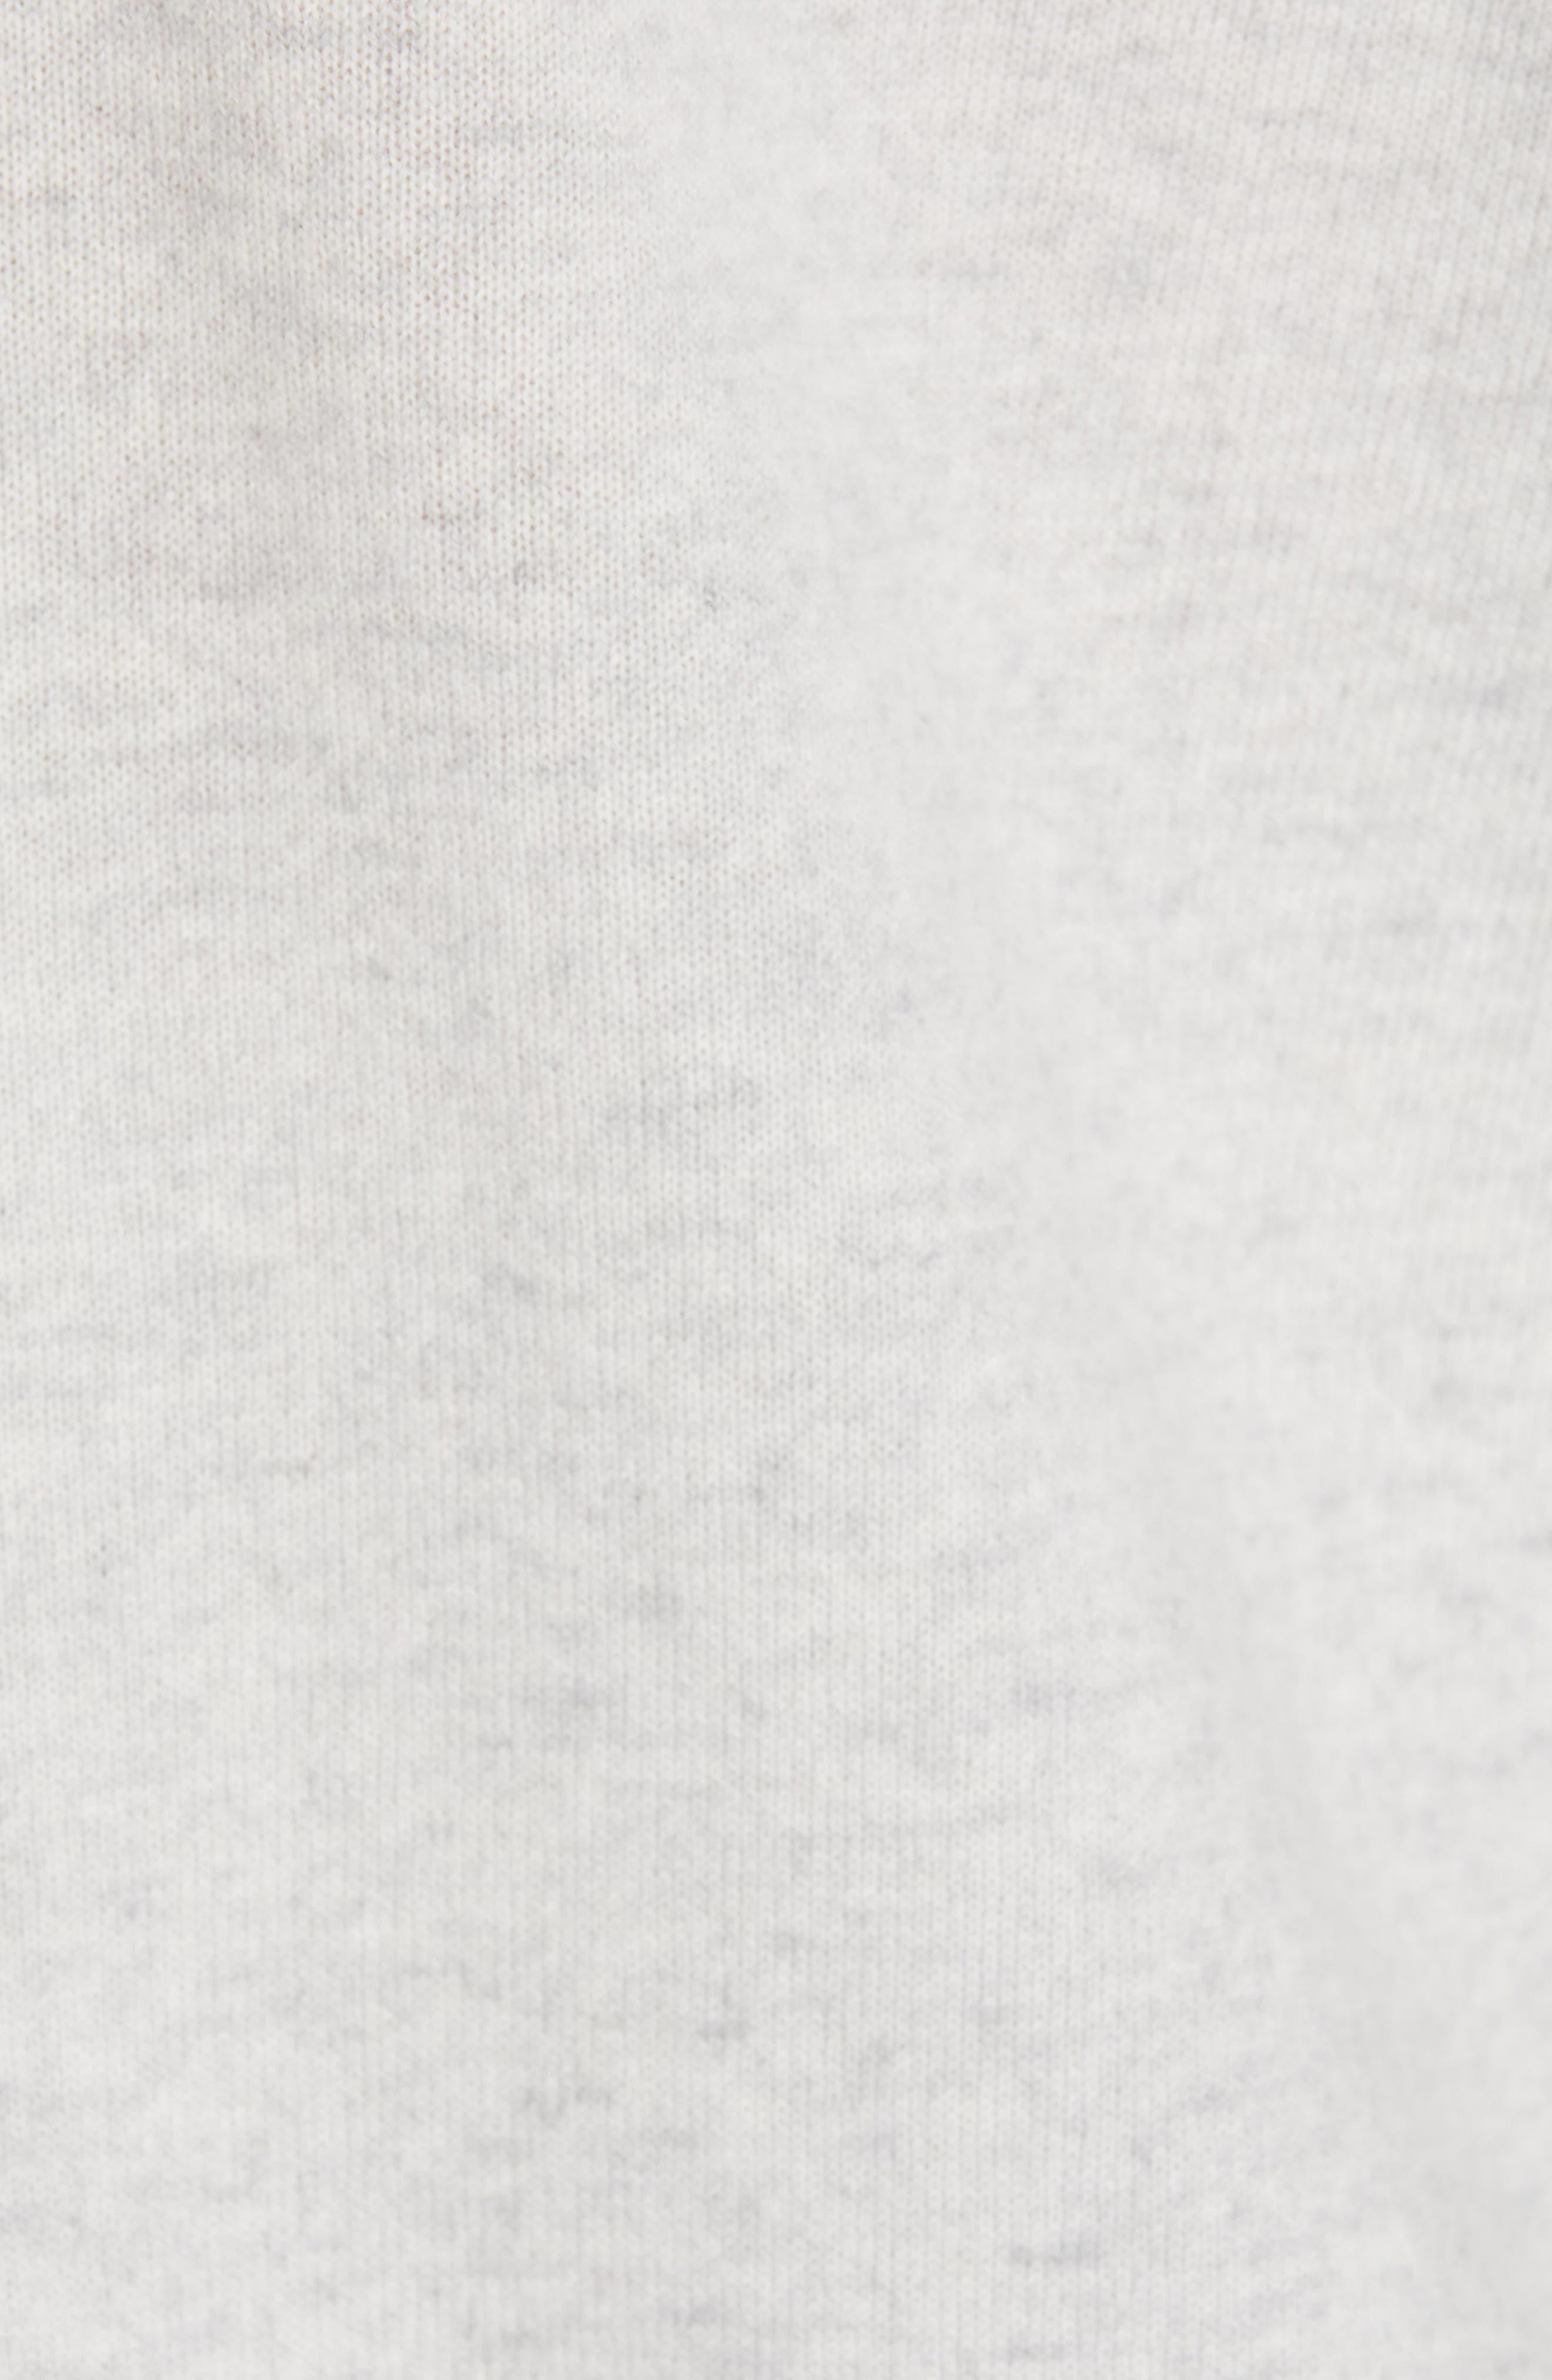 VINCE, Boxy Cashmere Sweater, Alternate thumbnail 5, color, LIGHT HEATHER GREY